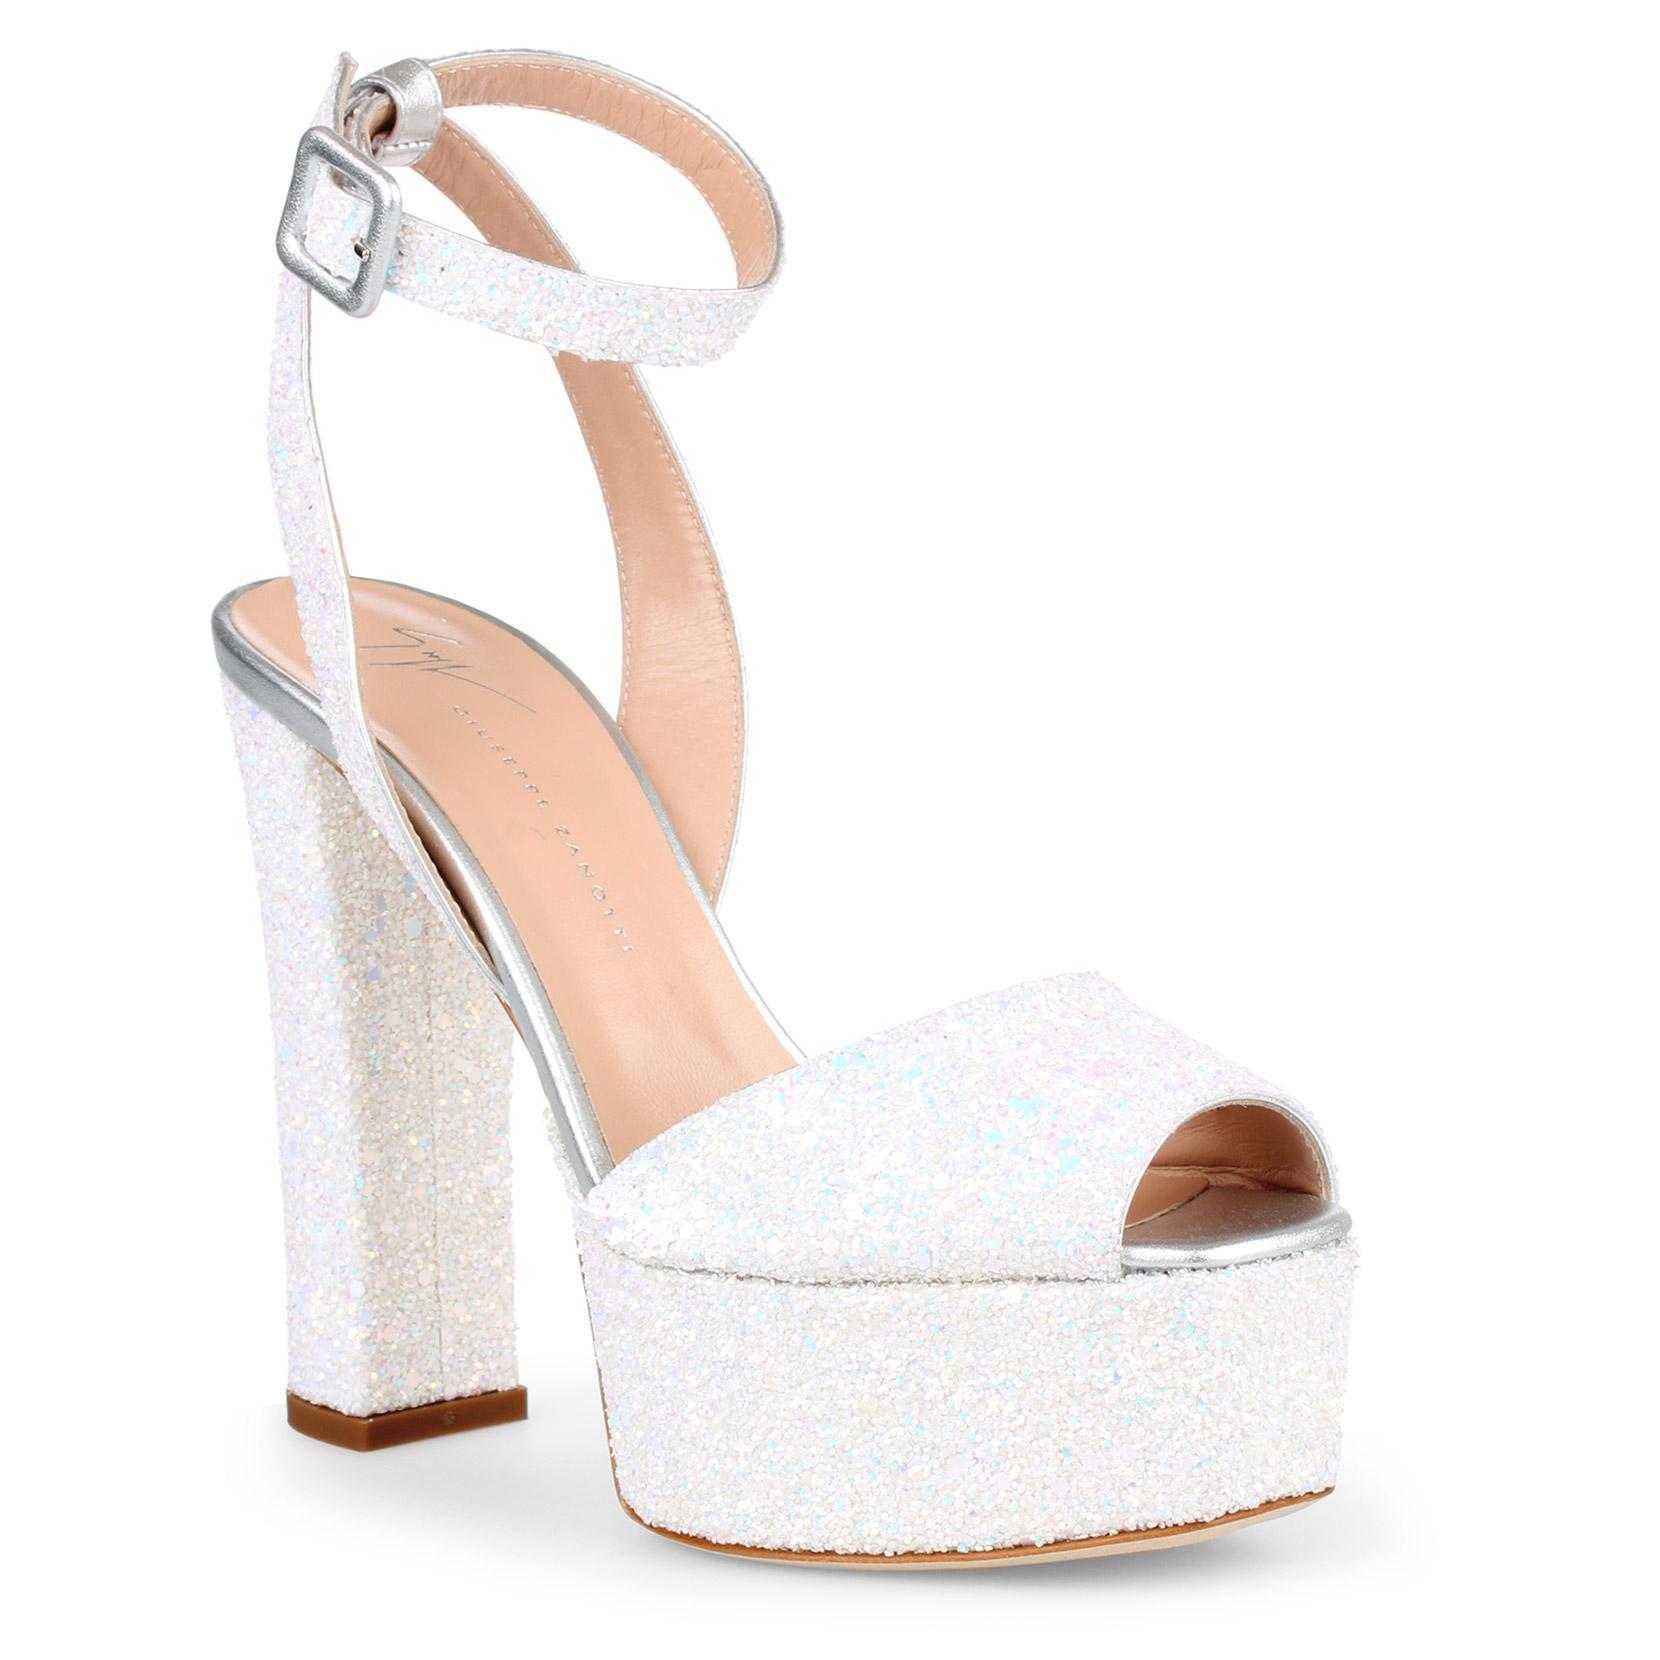 0424eeb30b57 Lyst - Giuseppe Zanotti Betty White Glitter Sandals in White